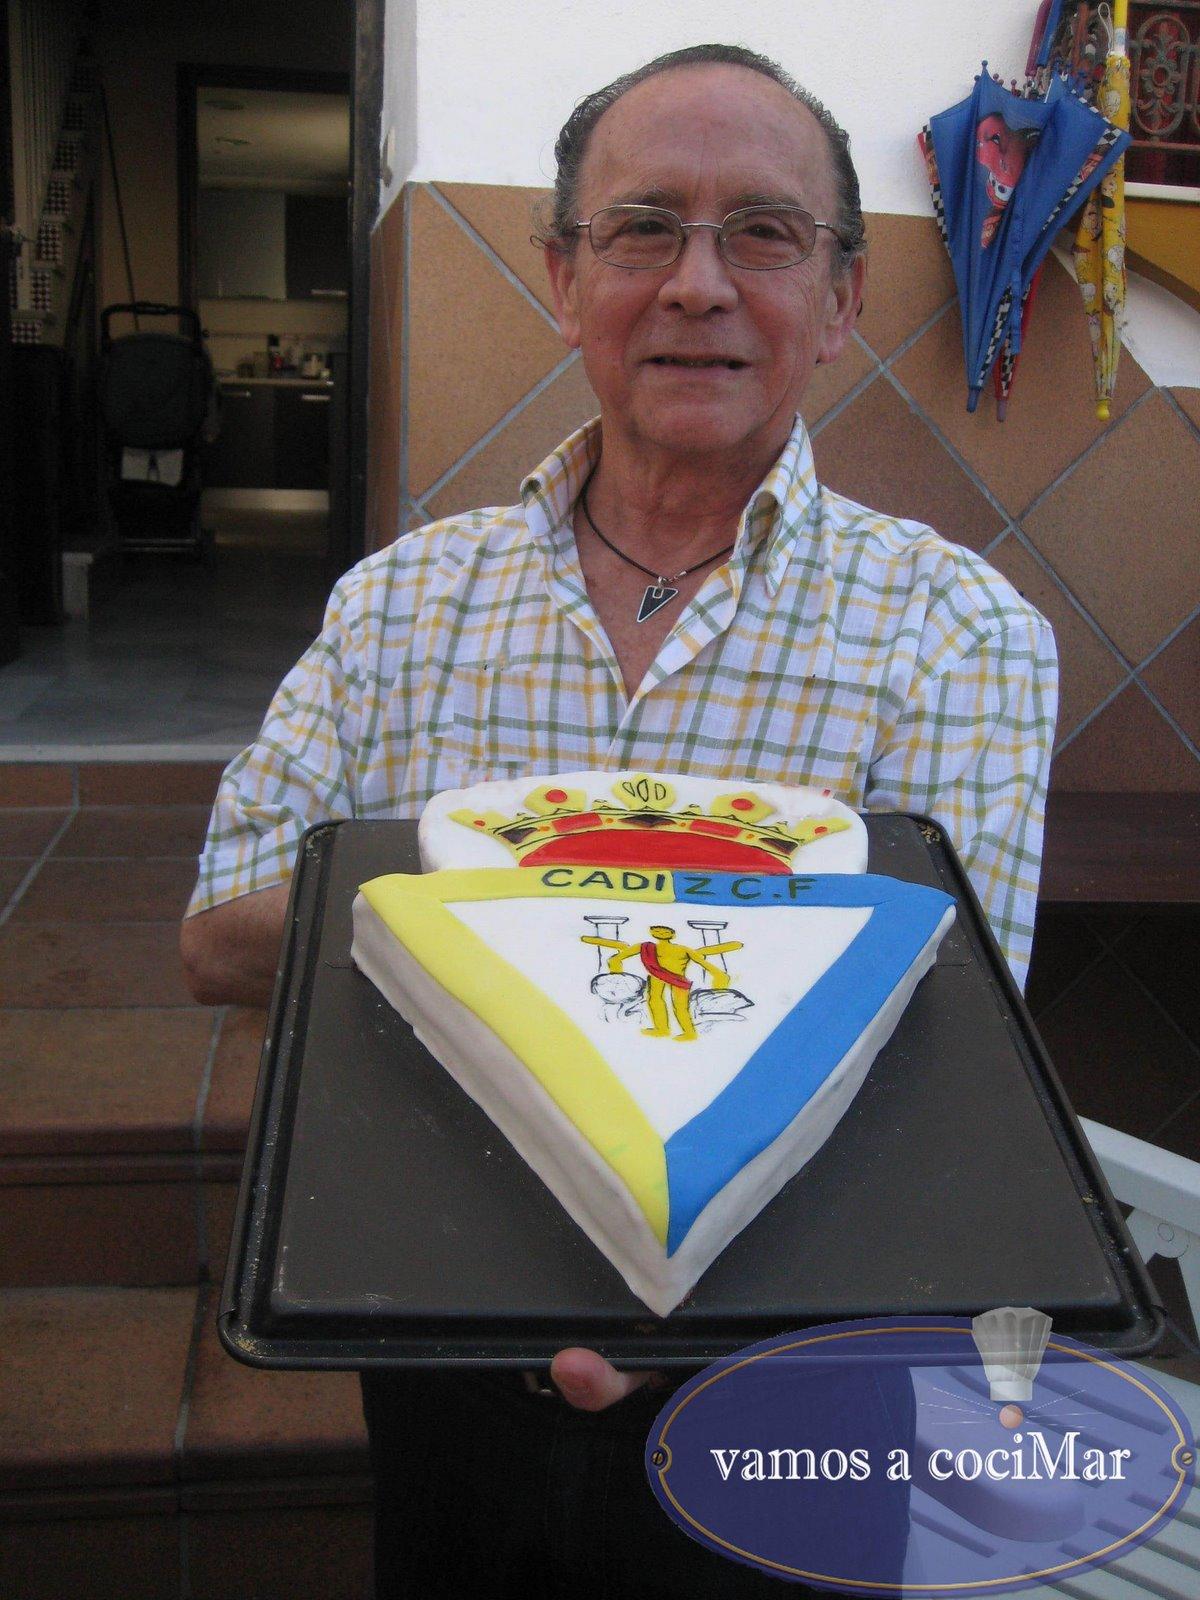 [tarta+Cádiz+C.F+copia]